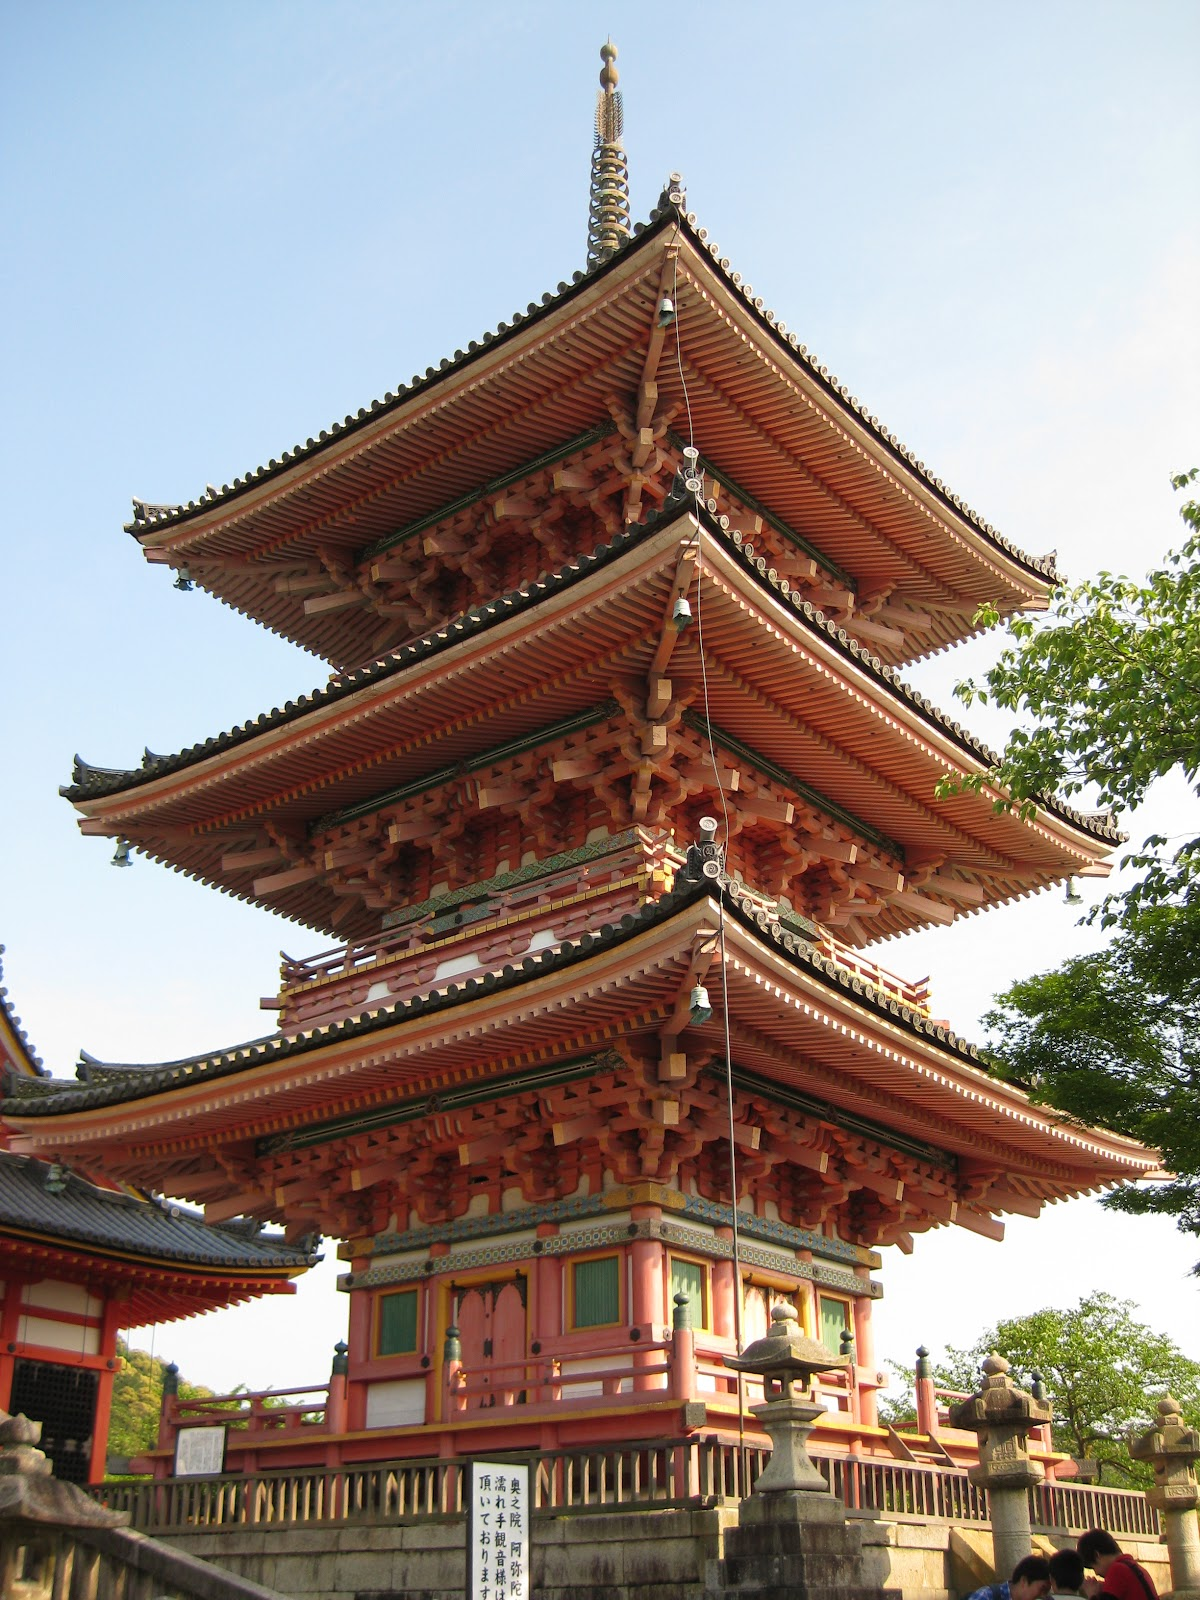 arquitectura japonesa arquitectura japonesa i ForArquitectura Japonesa Tradicional